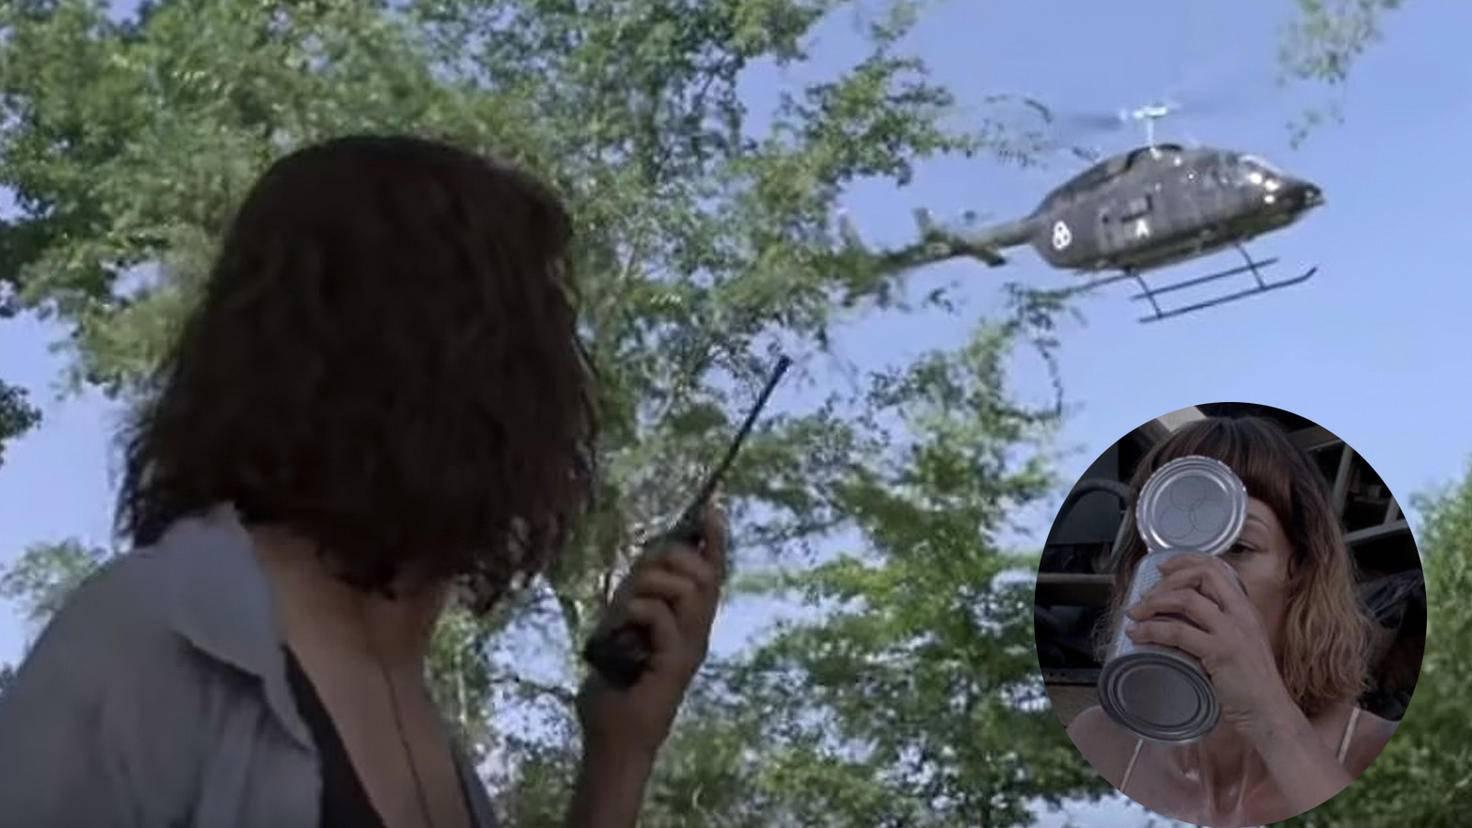 The Walking Dead-S09-Trailer-YouTube-TV Guide-Hubschrauber-The Walking Dead-S08E10-YouTube-The PT Channel-Jadis Dose